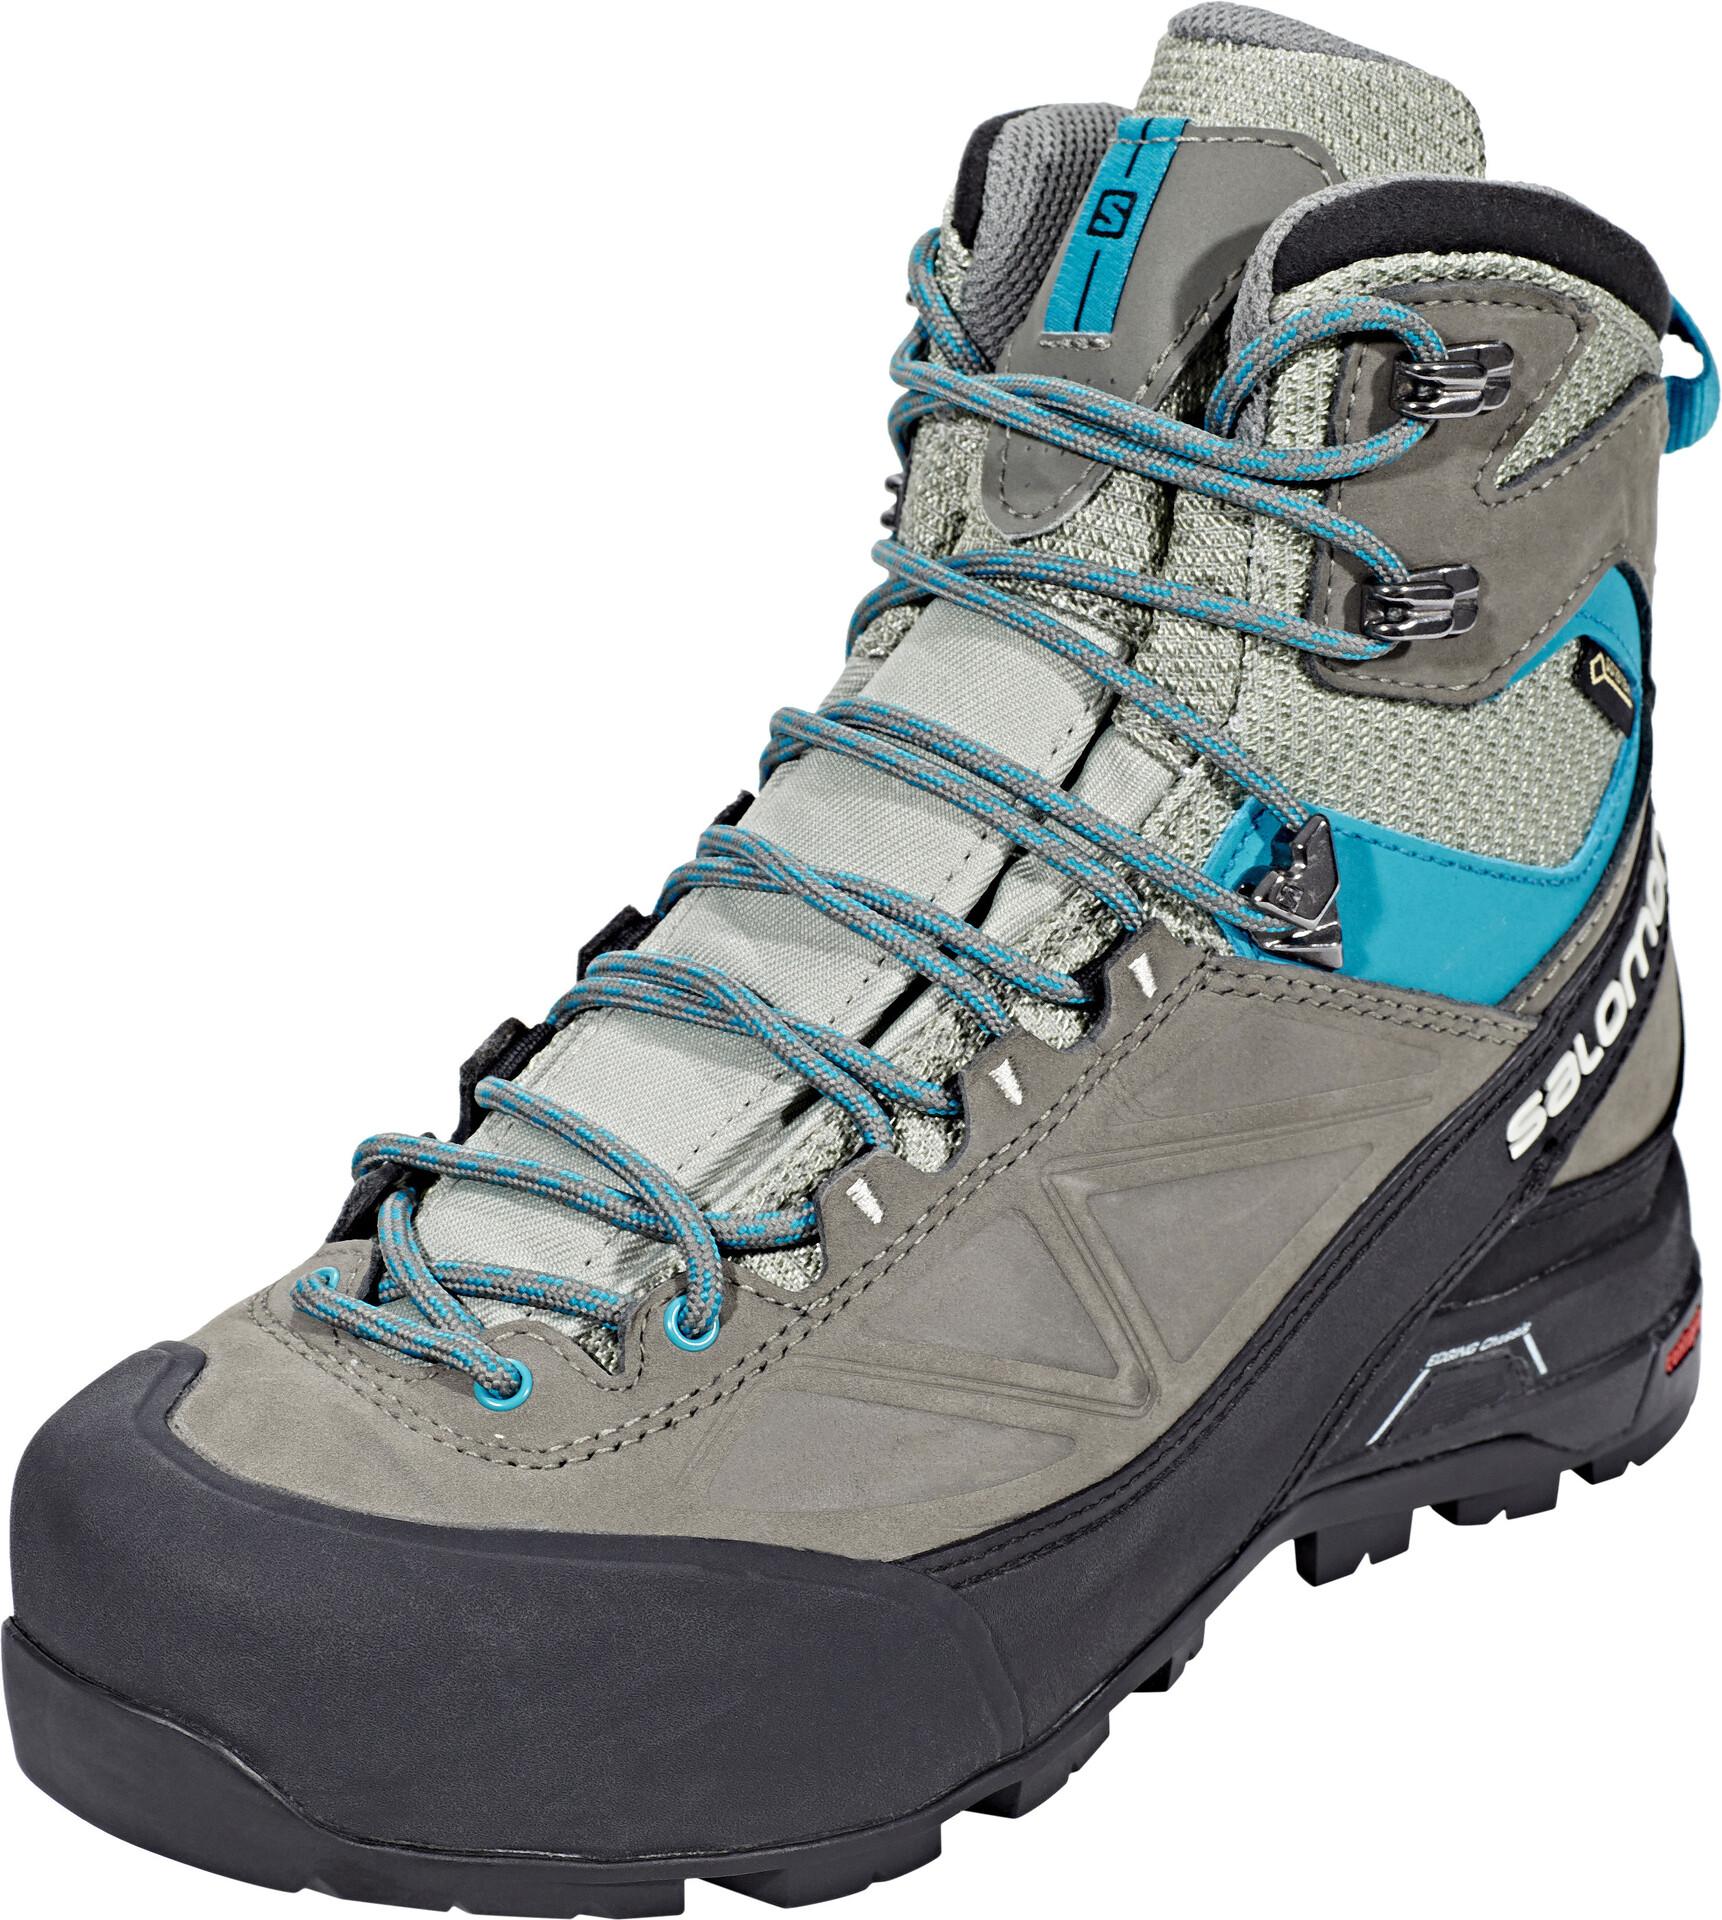 Mountain Sur Gtx X Femme Campz Chaussures Gris Alp Salomon qOR0Ew